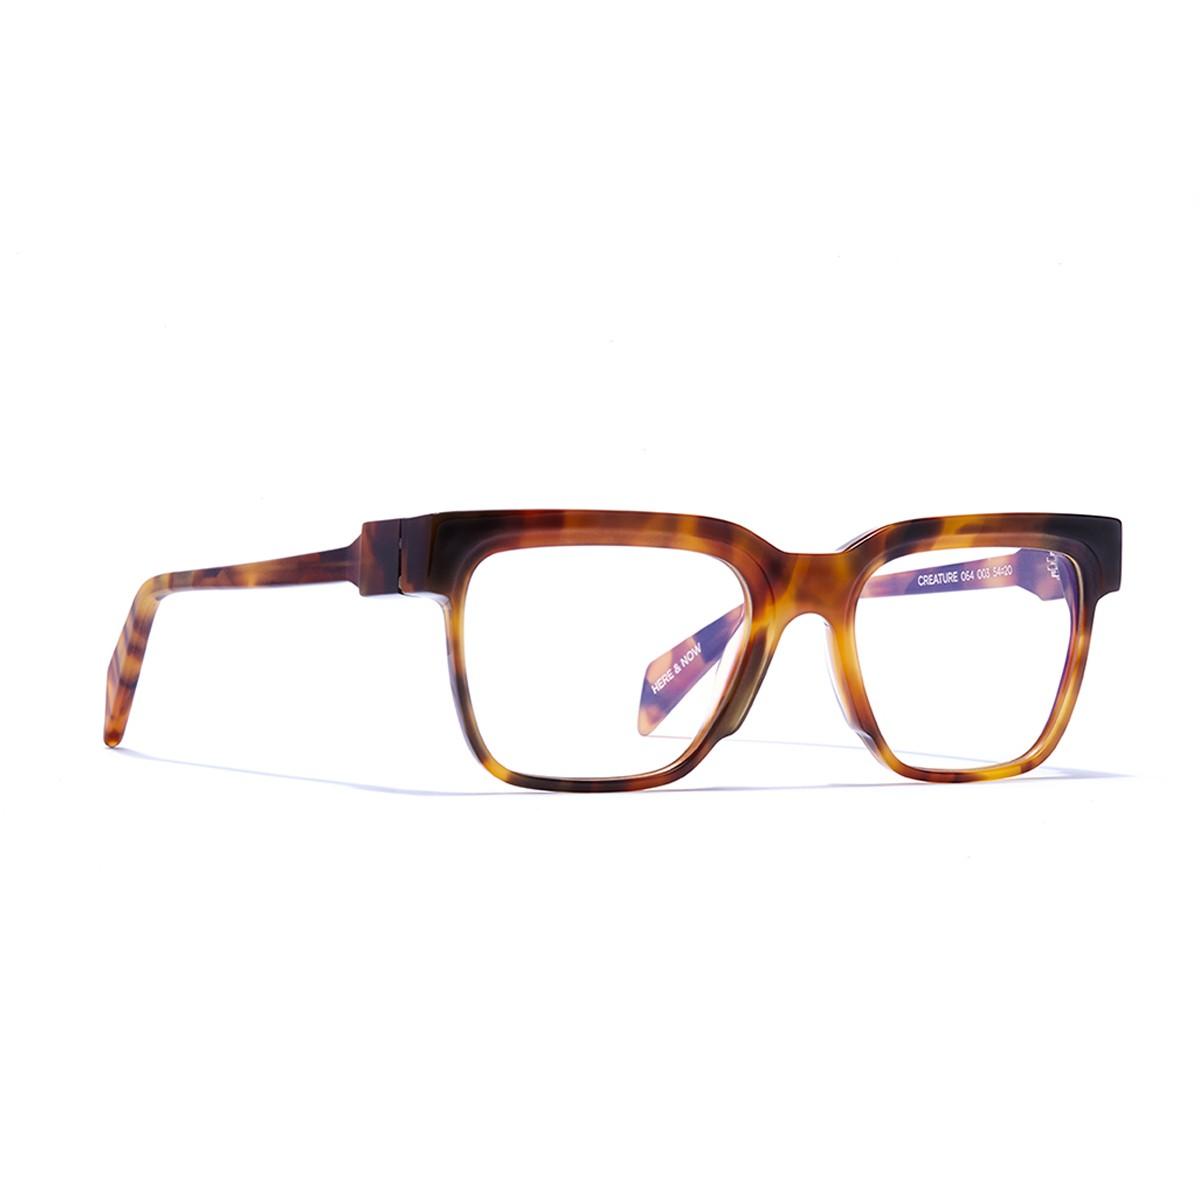 Siens Eye code 064   Occhiali da vista Unisex